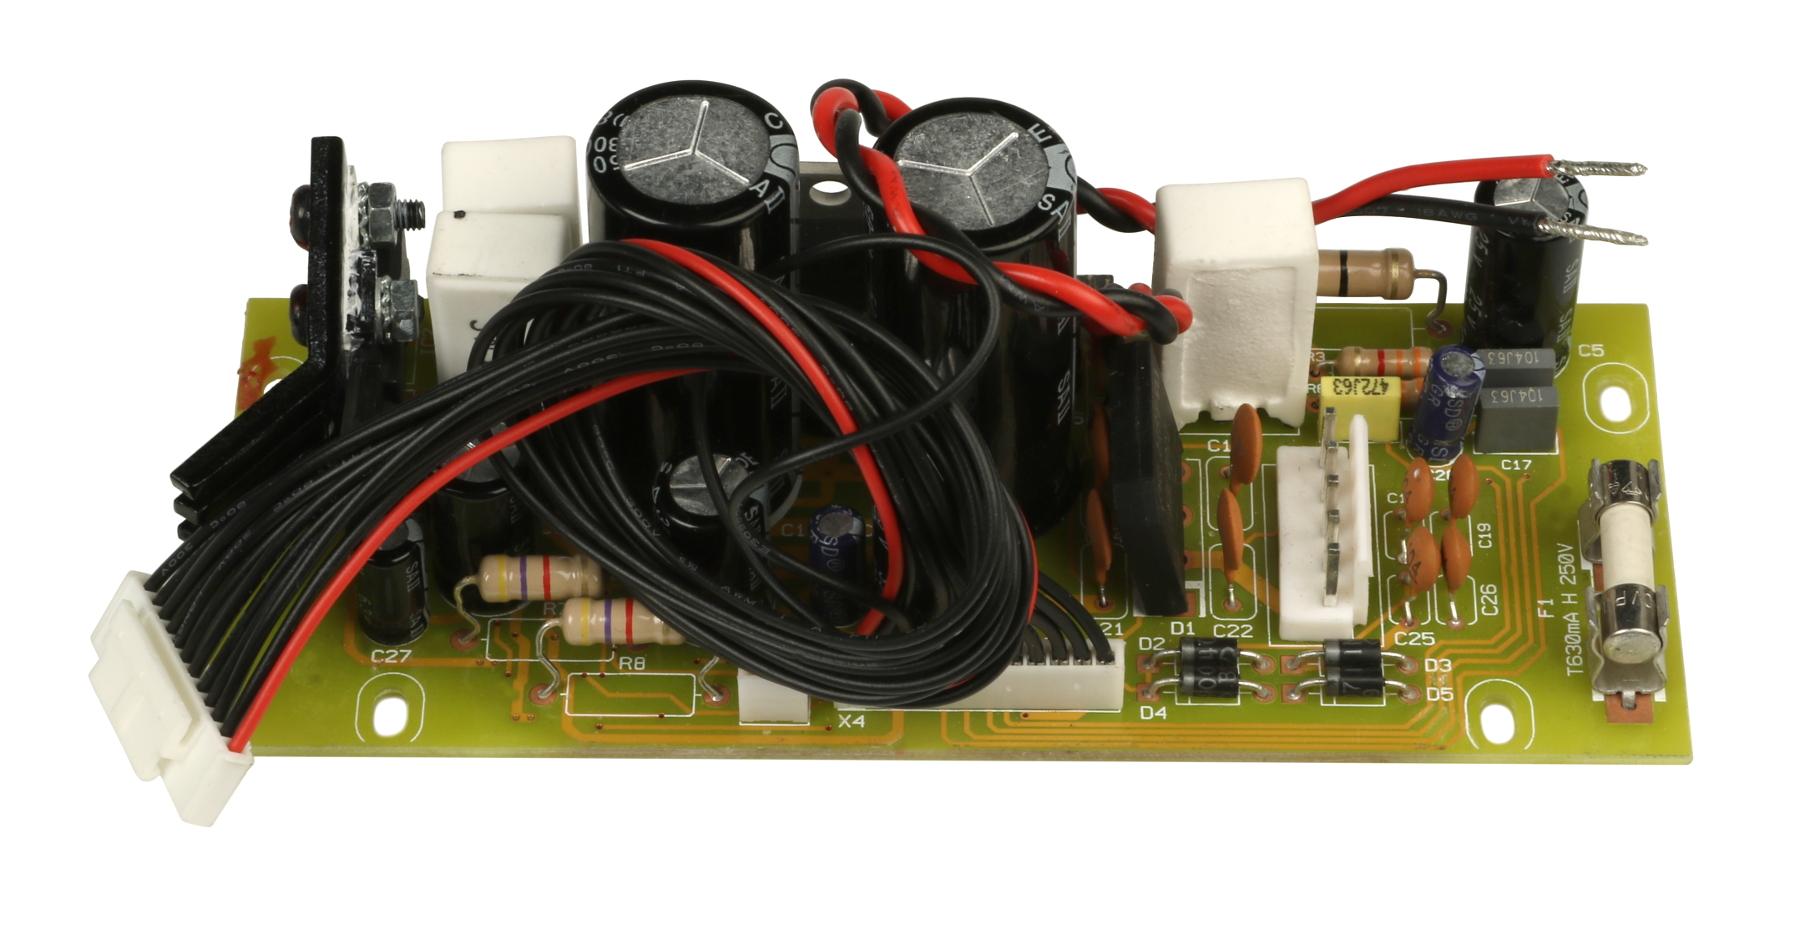 Behringer Q05-45900-05620 Main Rev D PCB for VT100 Q05-45900-05620